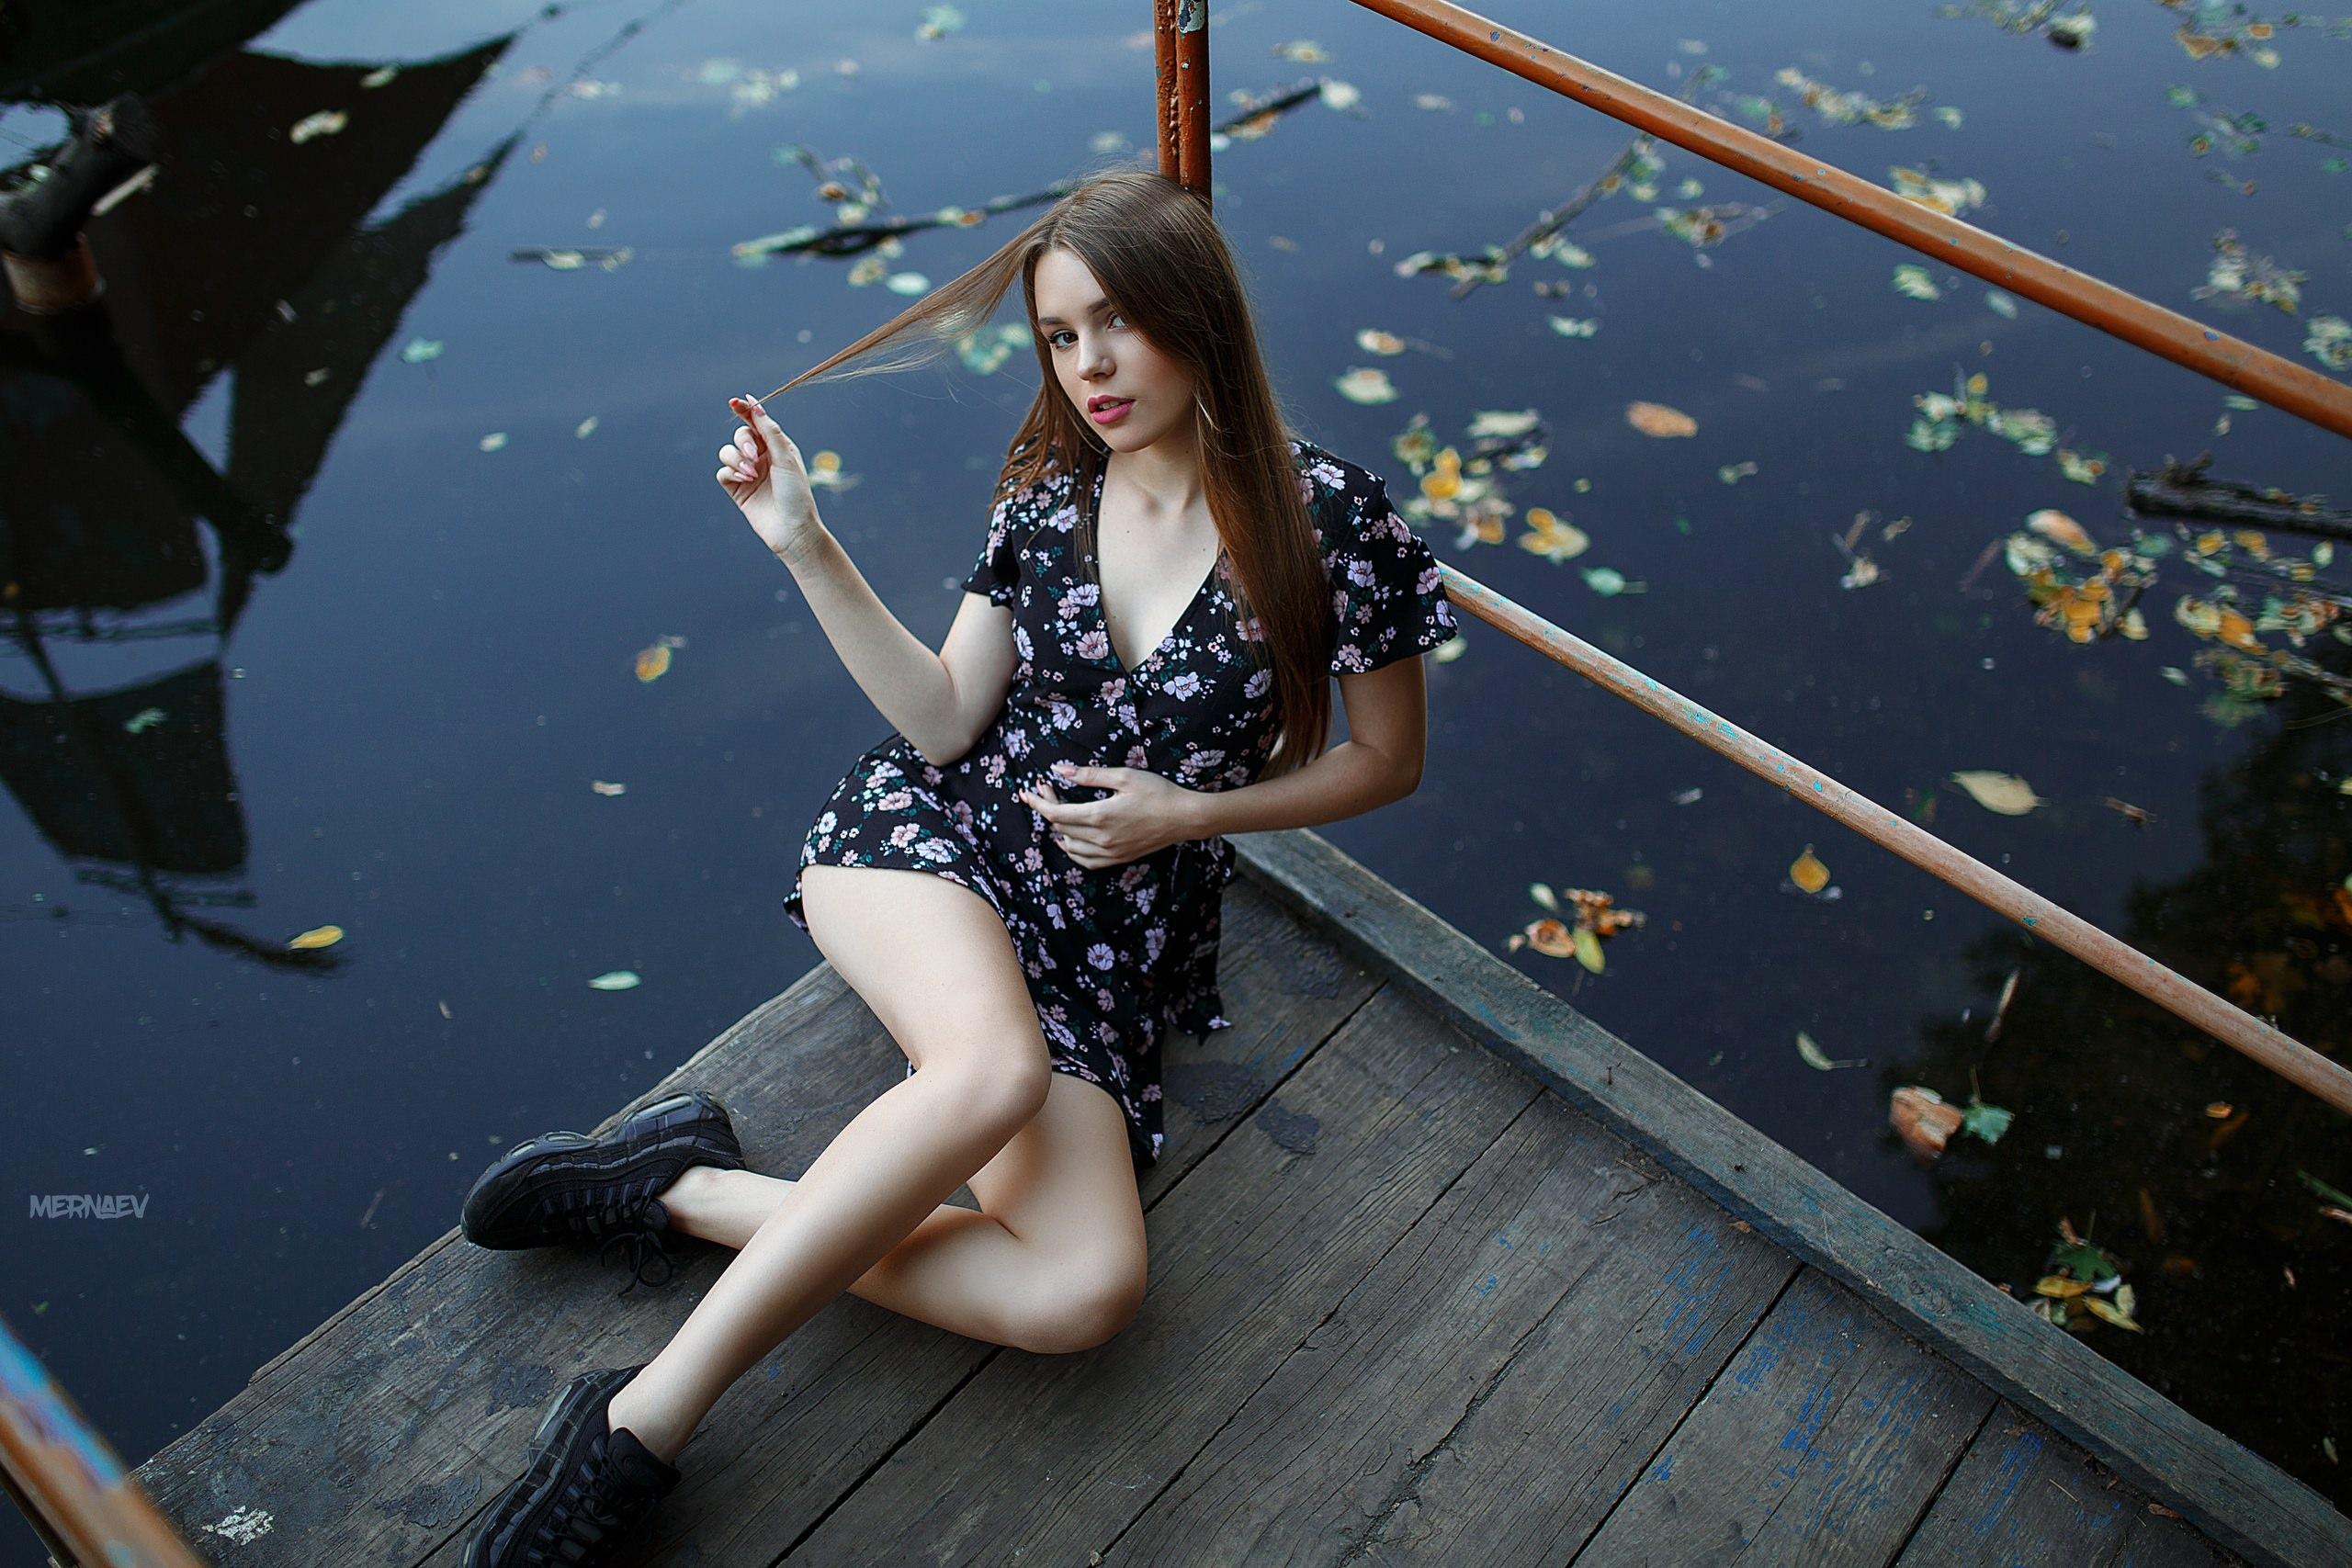 People 2560x1707 women sitting dress sneakers pier Artyom Mernaev water leaves women outdoors looking up summer  dress black boots red lipstick high angle brunette